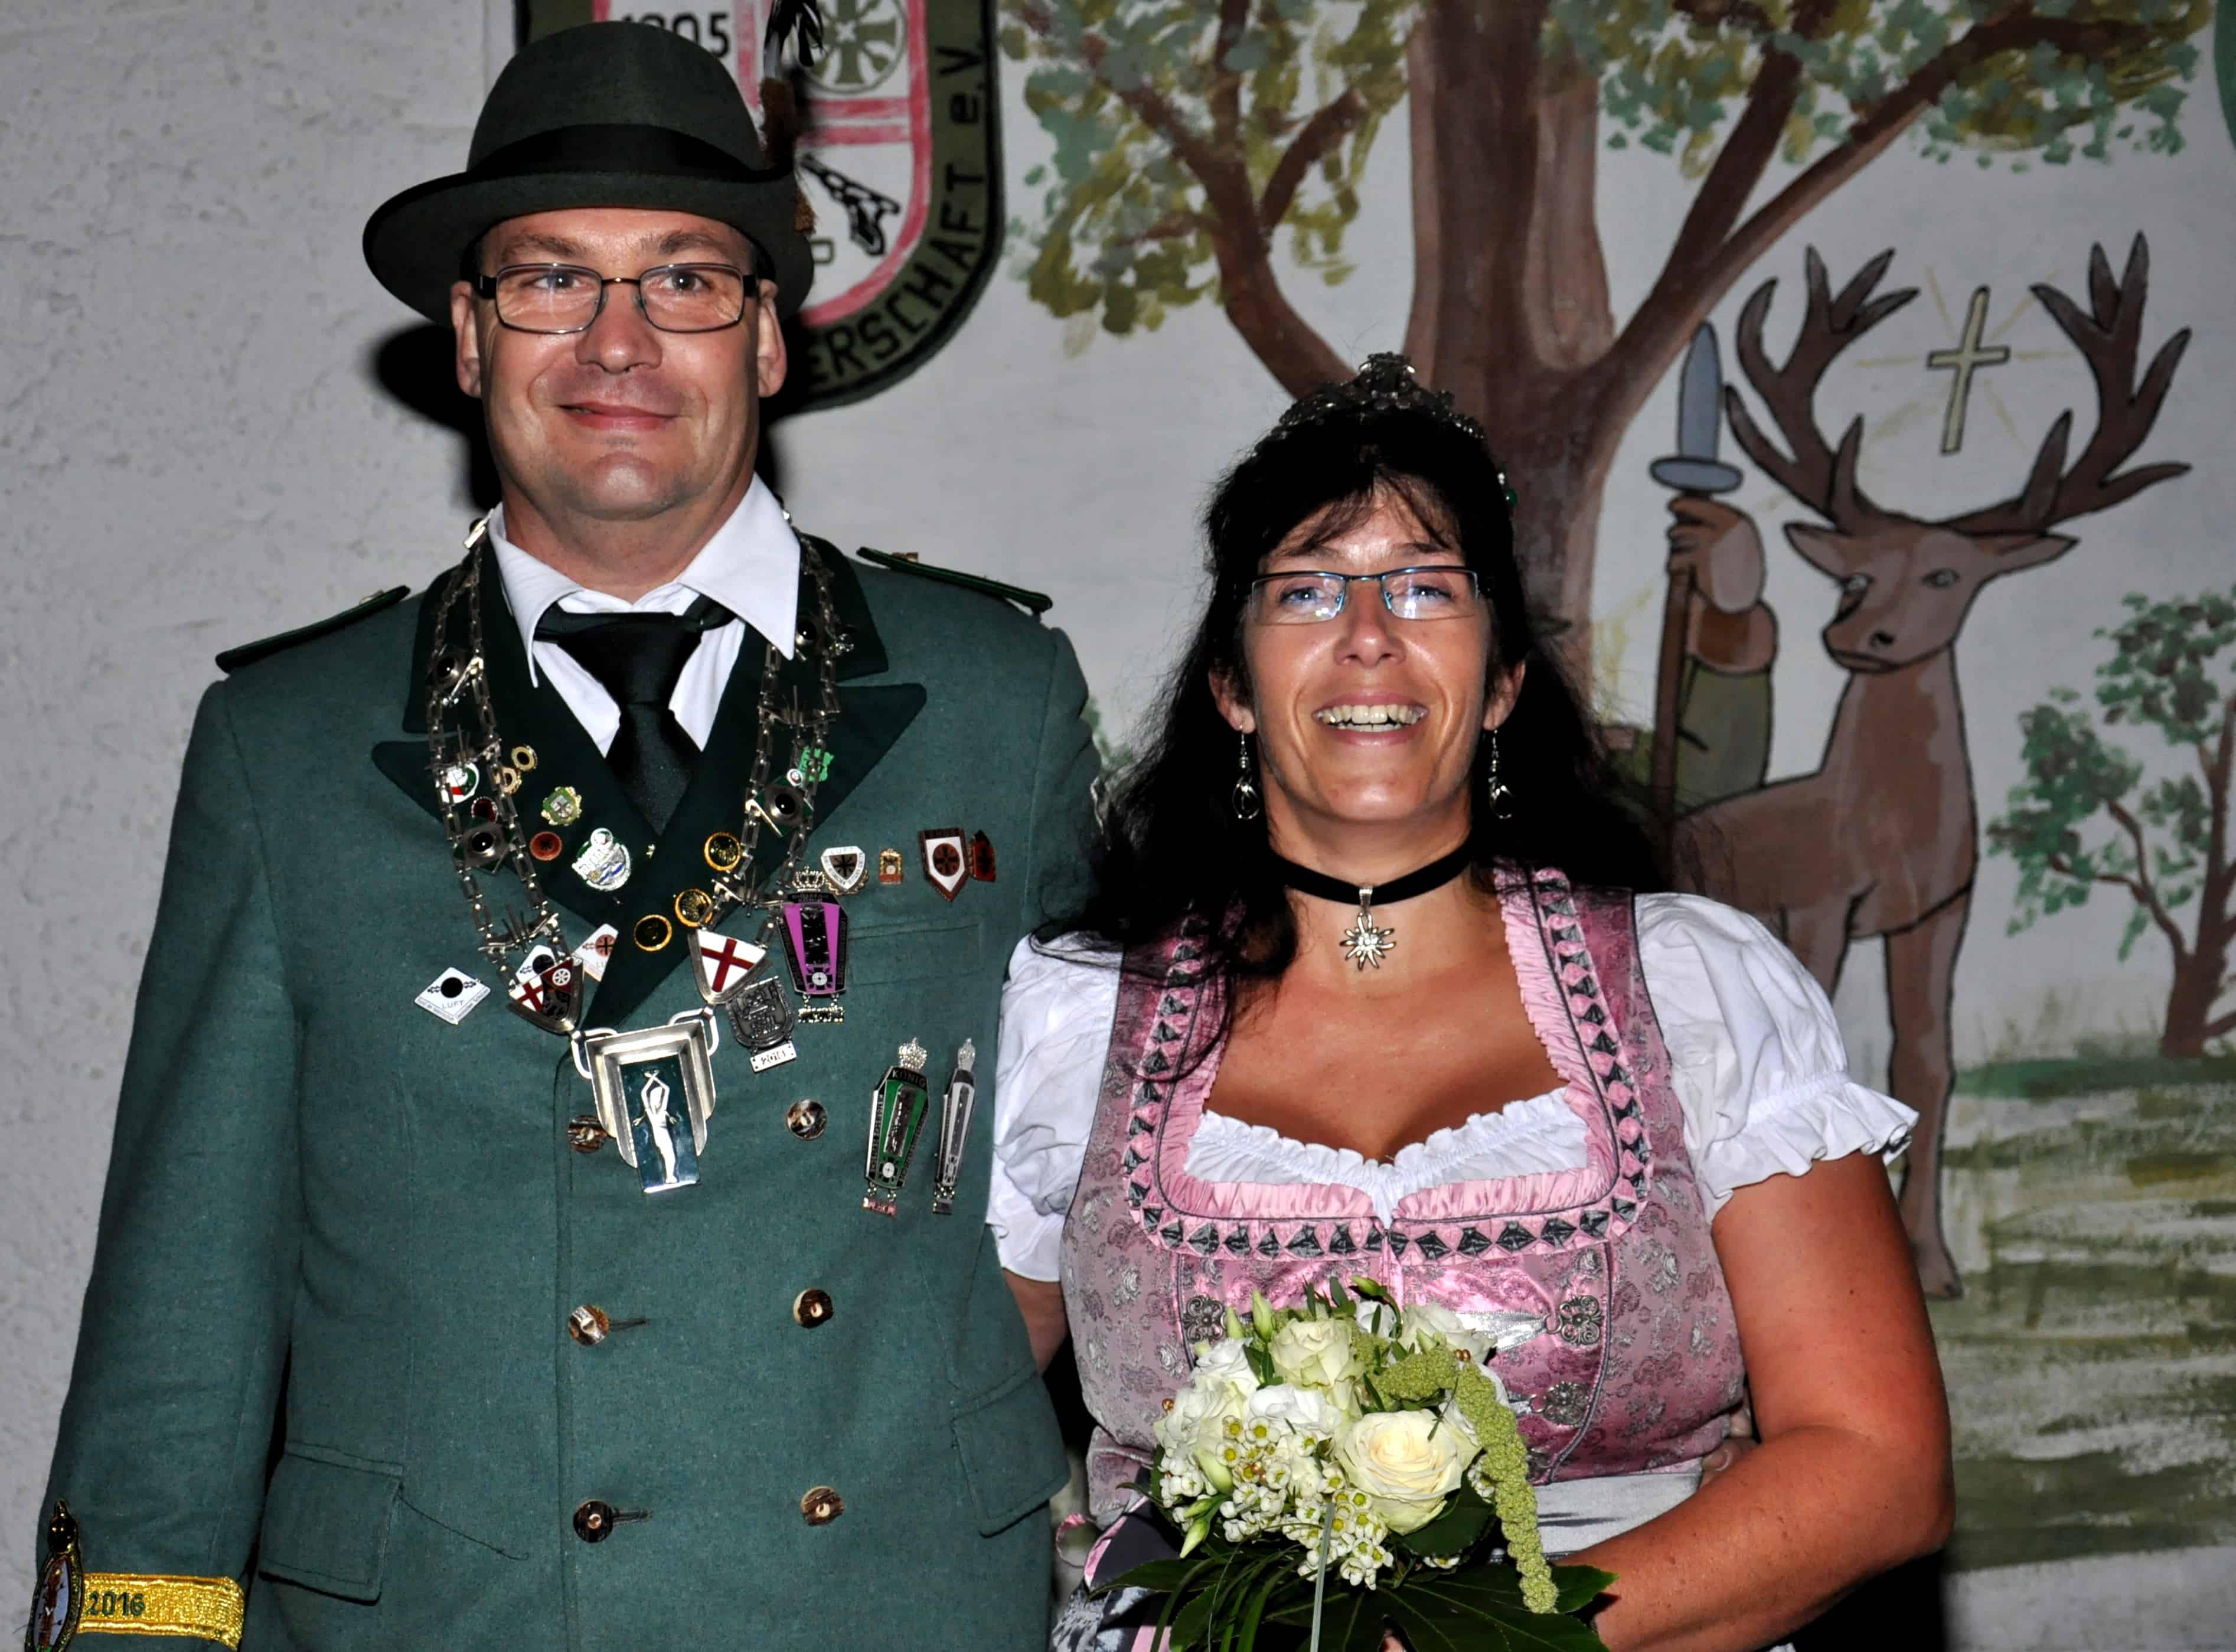 Königspaar Stefan und Nicole Tullius